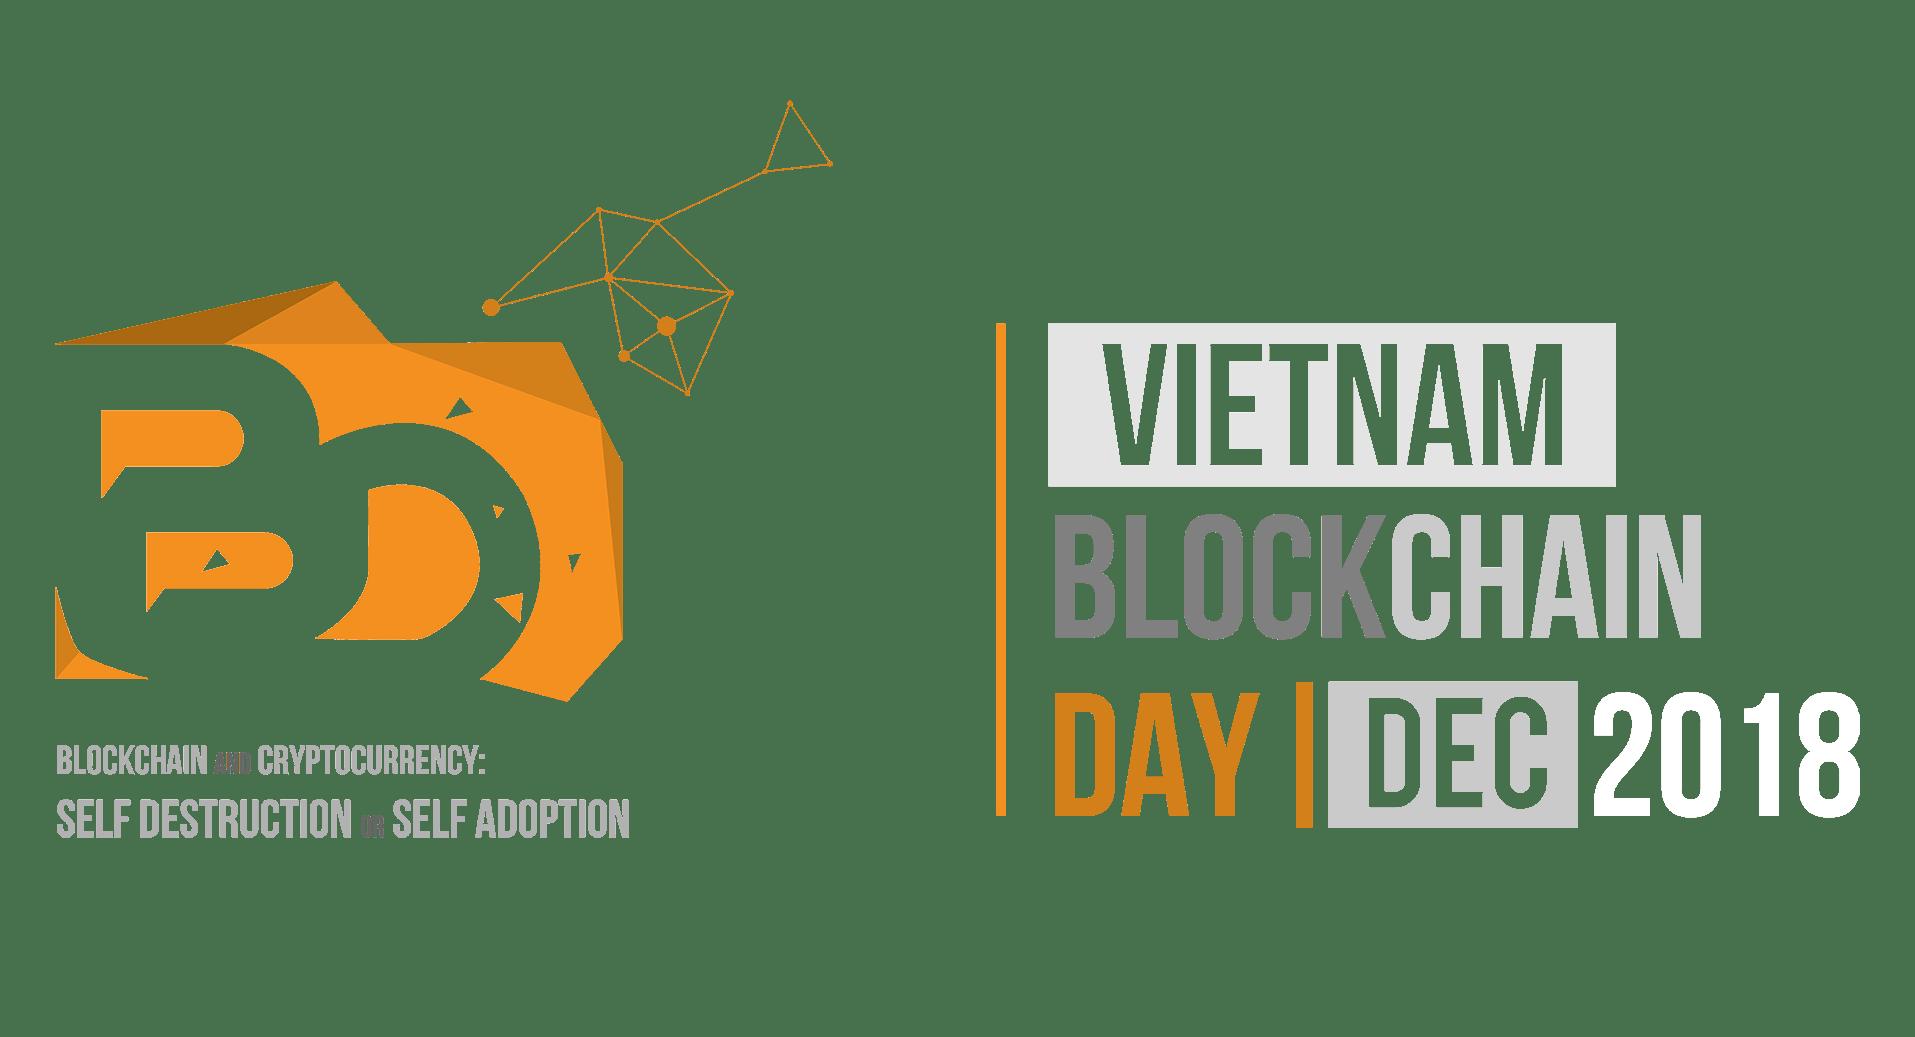 VIETNAM BLOCKCHAIN DAY SEASON 2